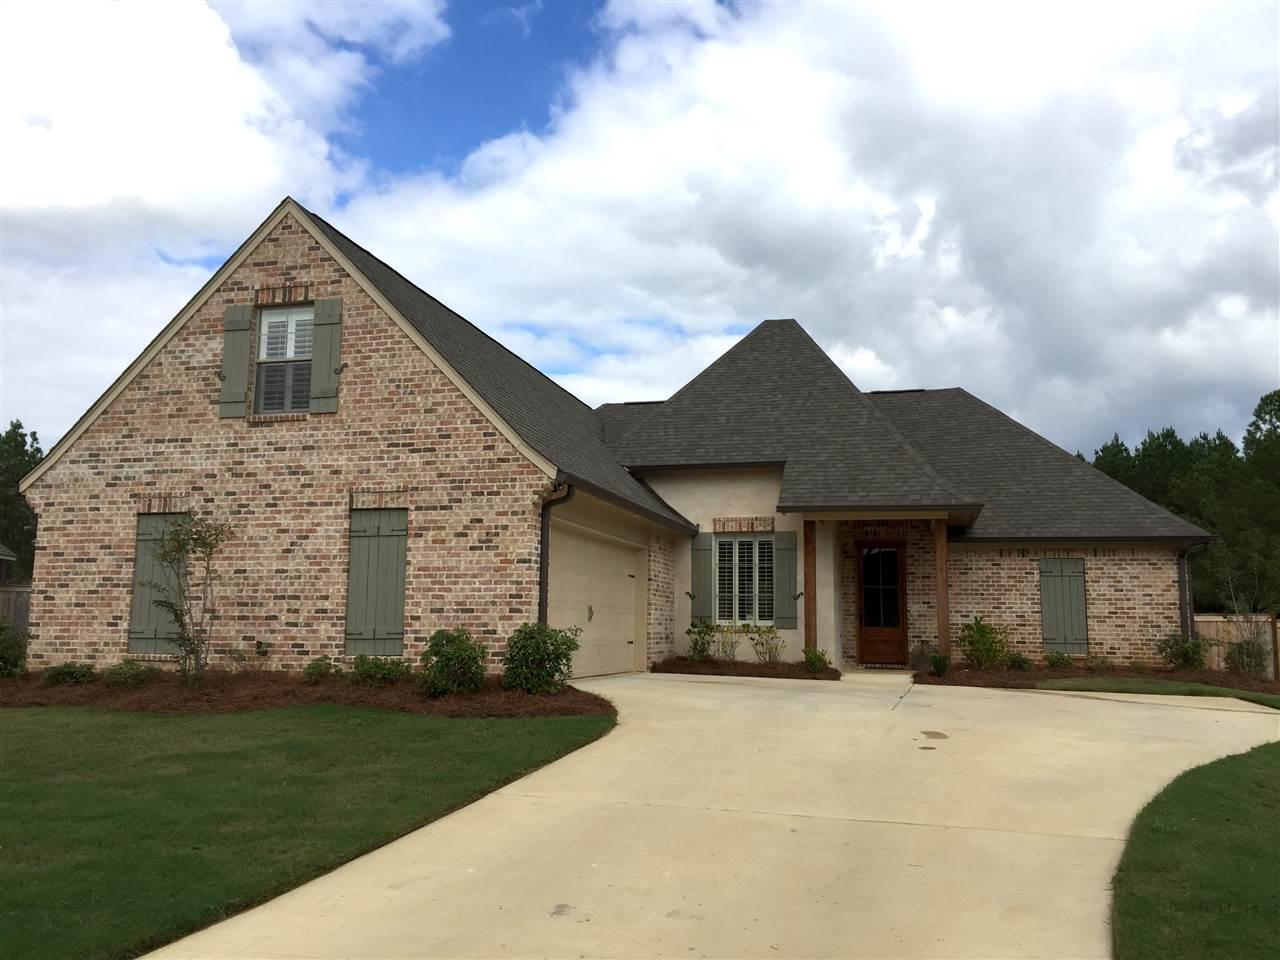 Real Estate for Sale, ListingId: 36644647, Madison,MS39110